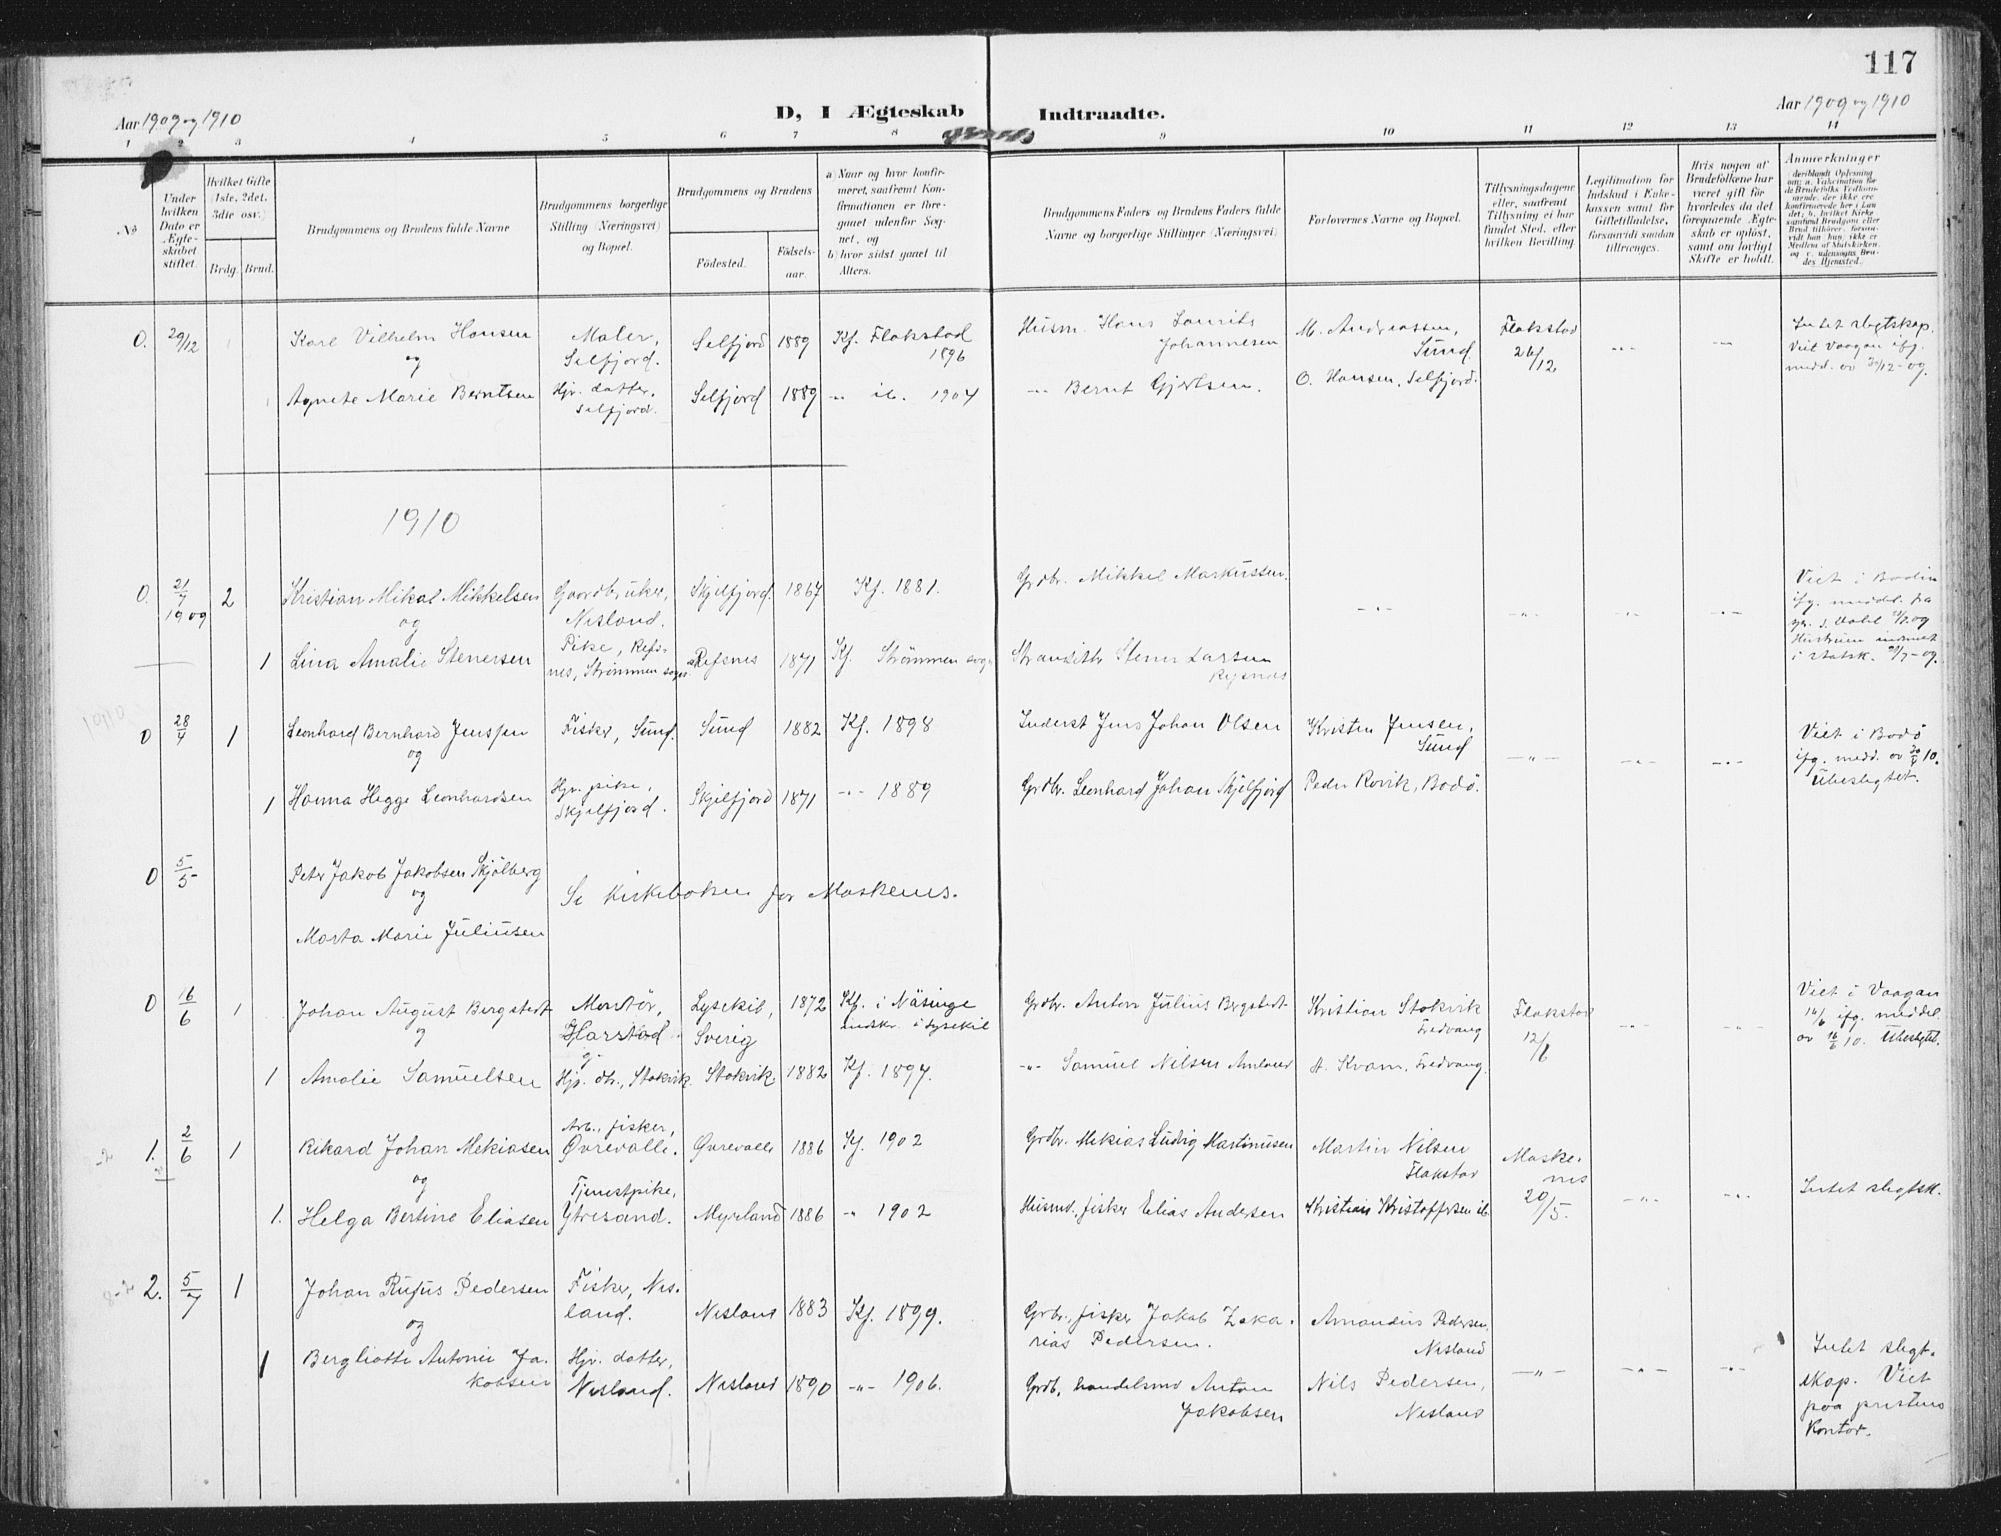 SAT, Ministerialprotokoller, klokkerbøker og fødselsregistre - Nordland, 885/L1206: Ministerialbok nr. 885A07, 1905-1915, s. 117